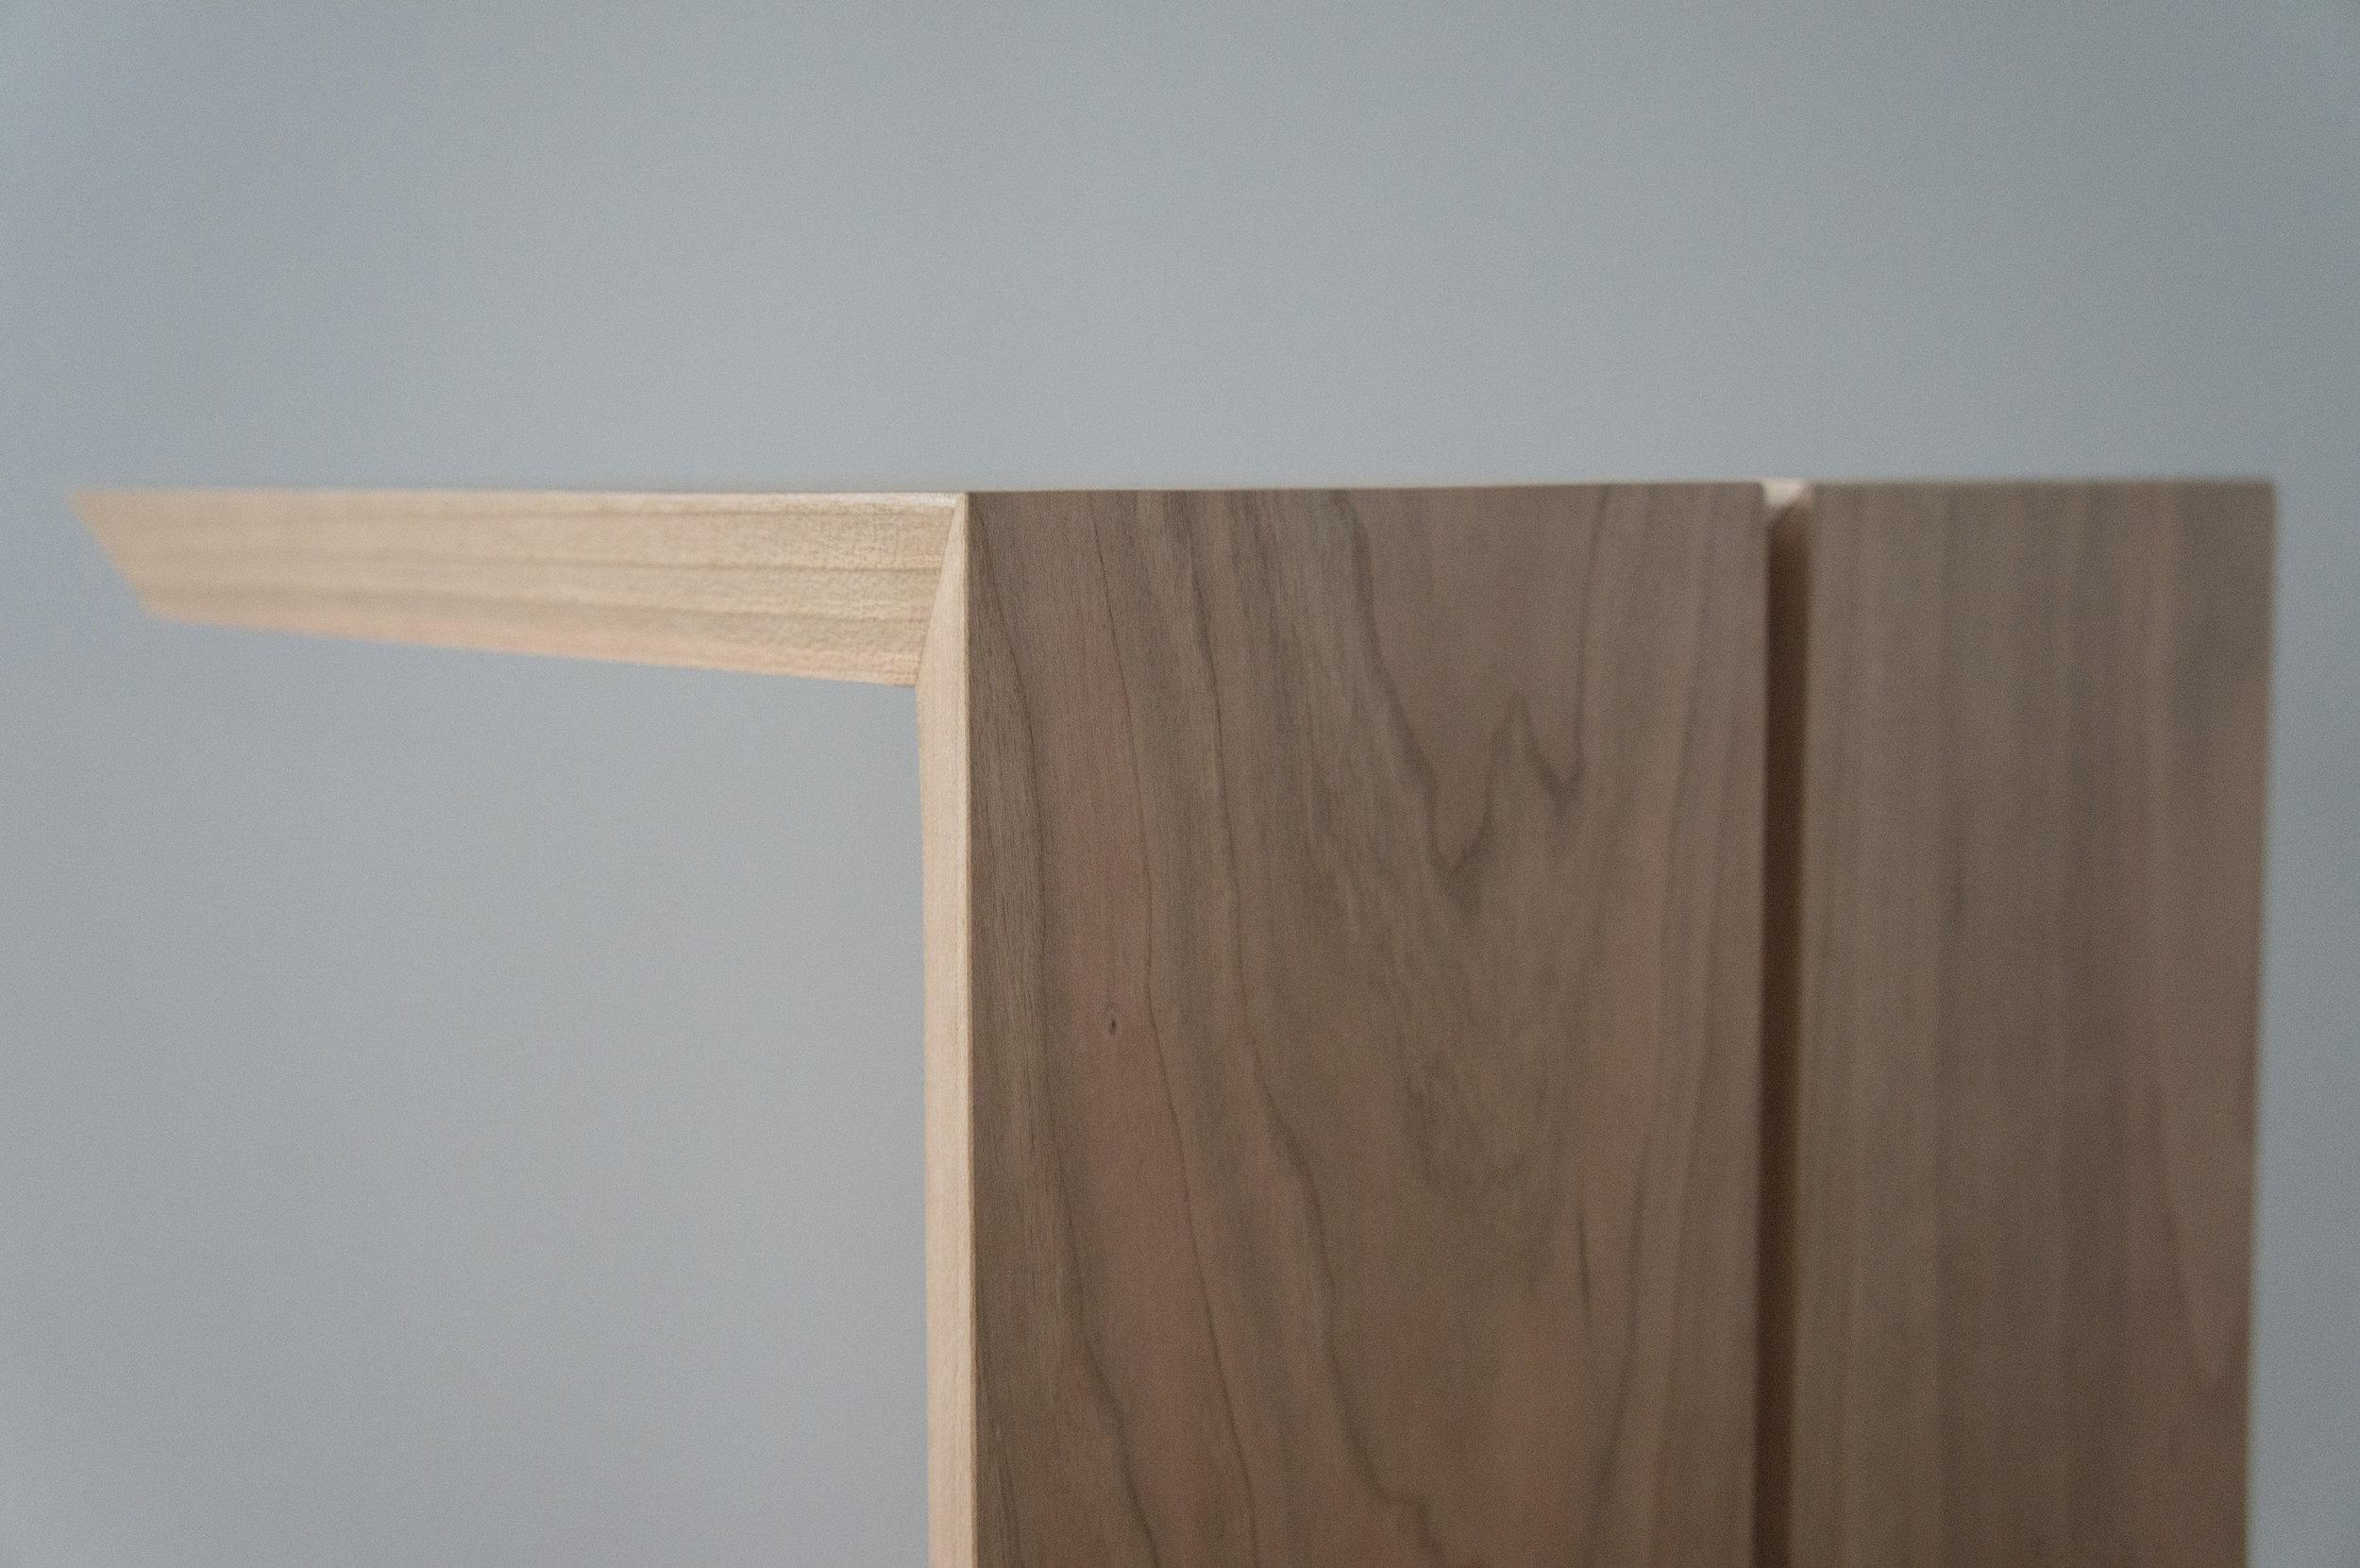 Euclid table_SONY NEX_clse up back corner.jpg